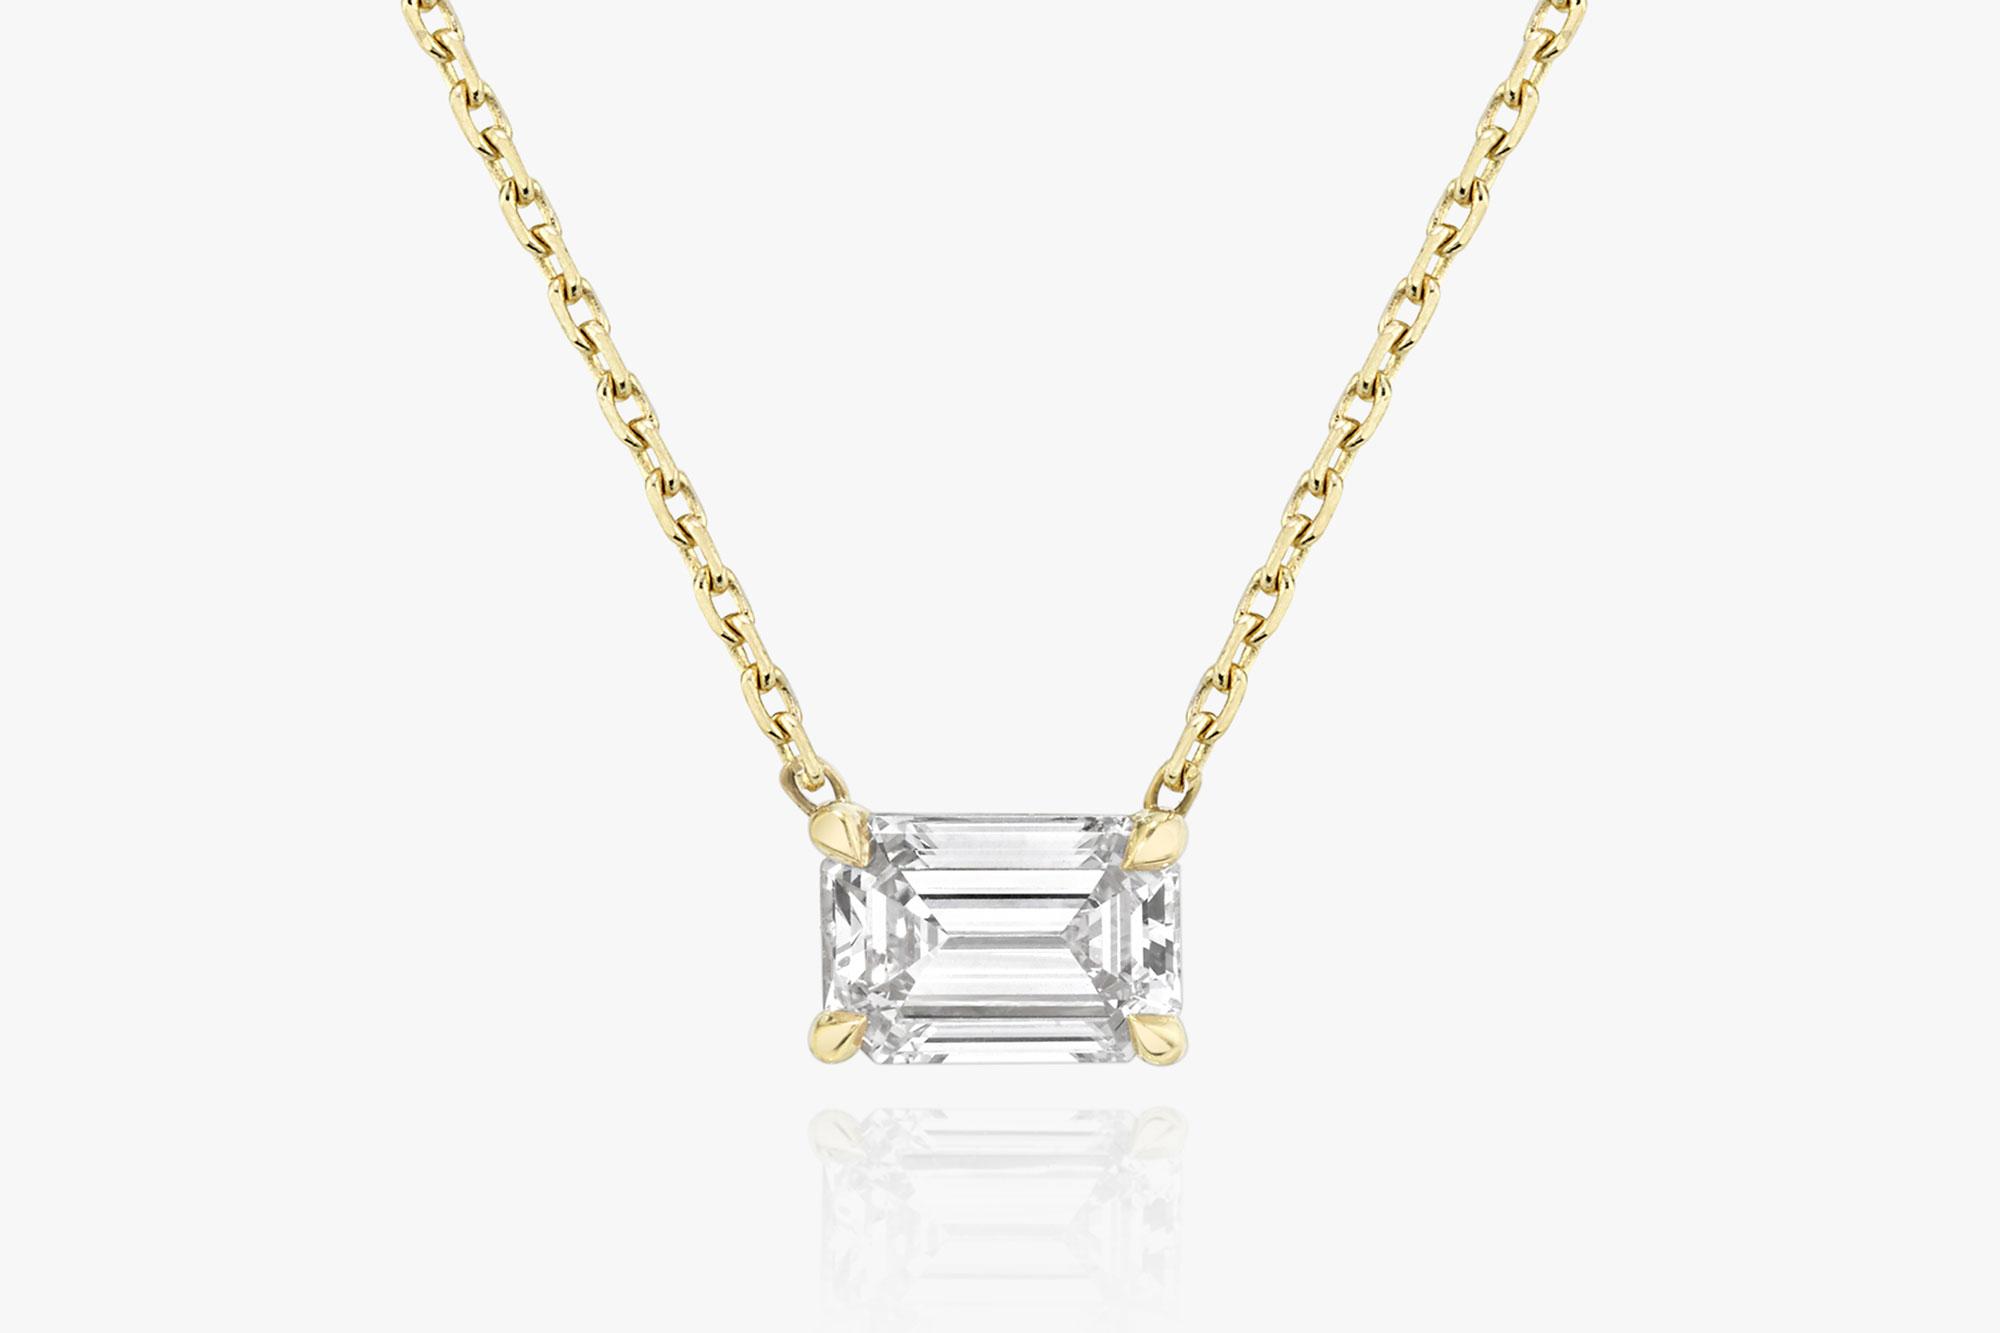 Lab grown diamonds, emerald shape diamond, yellow gold